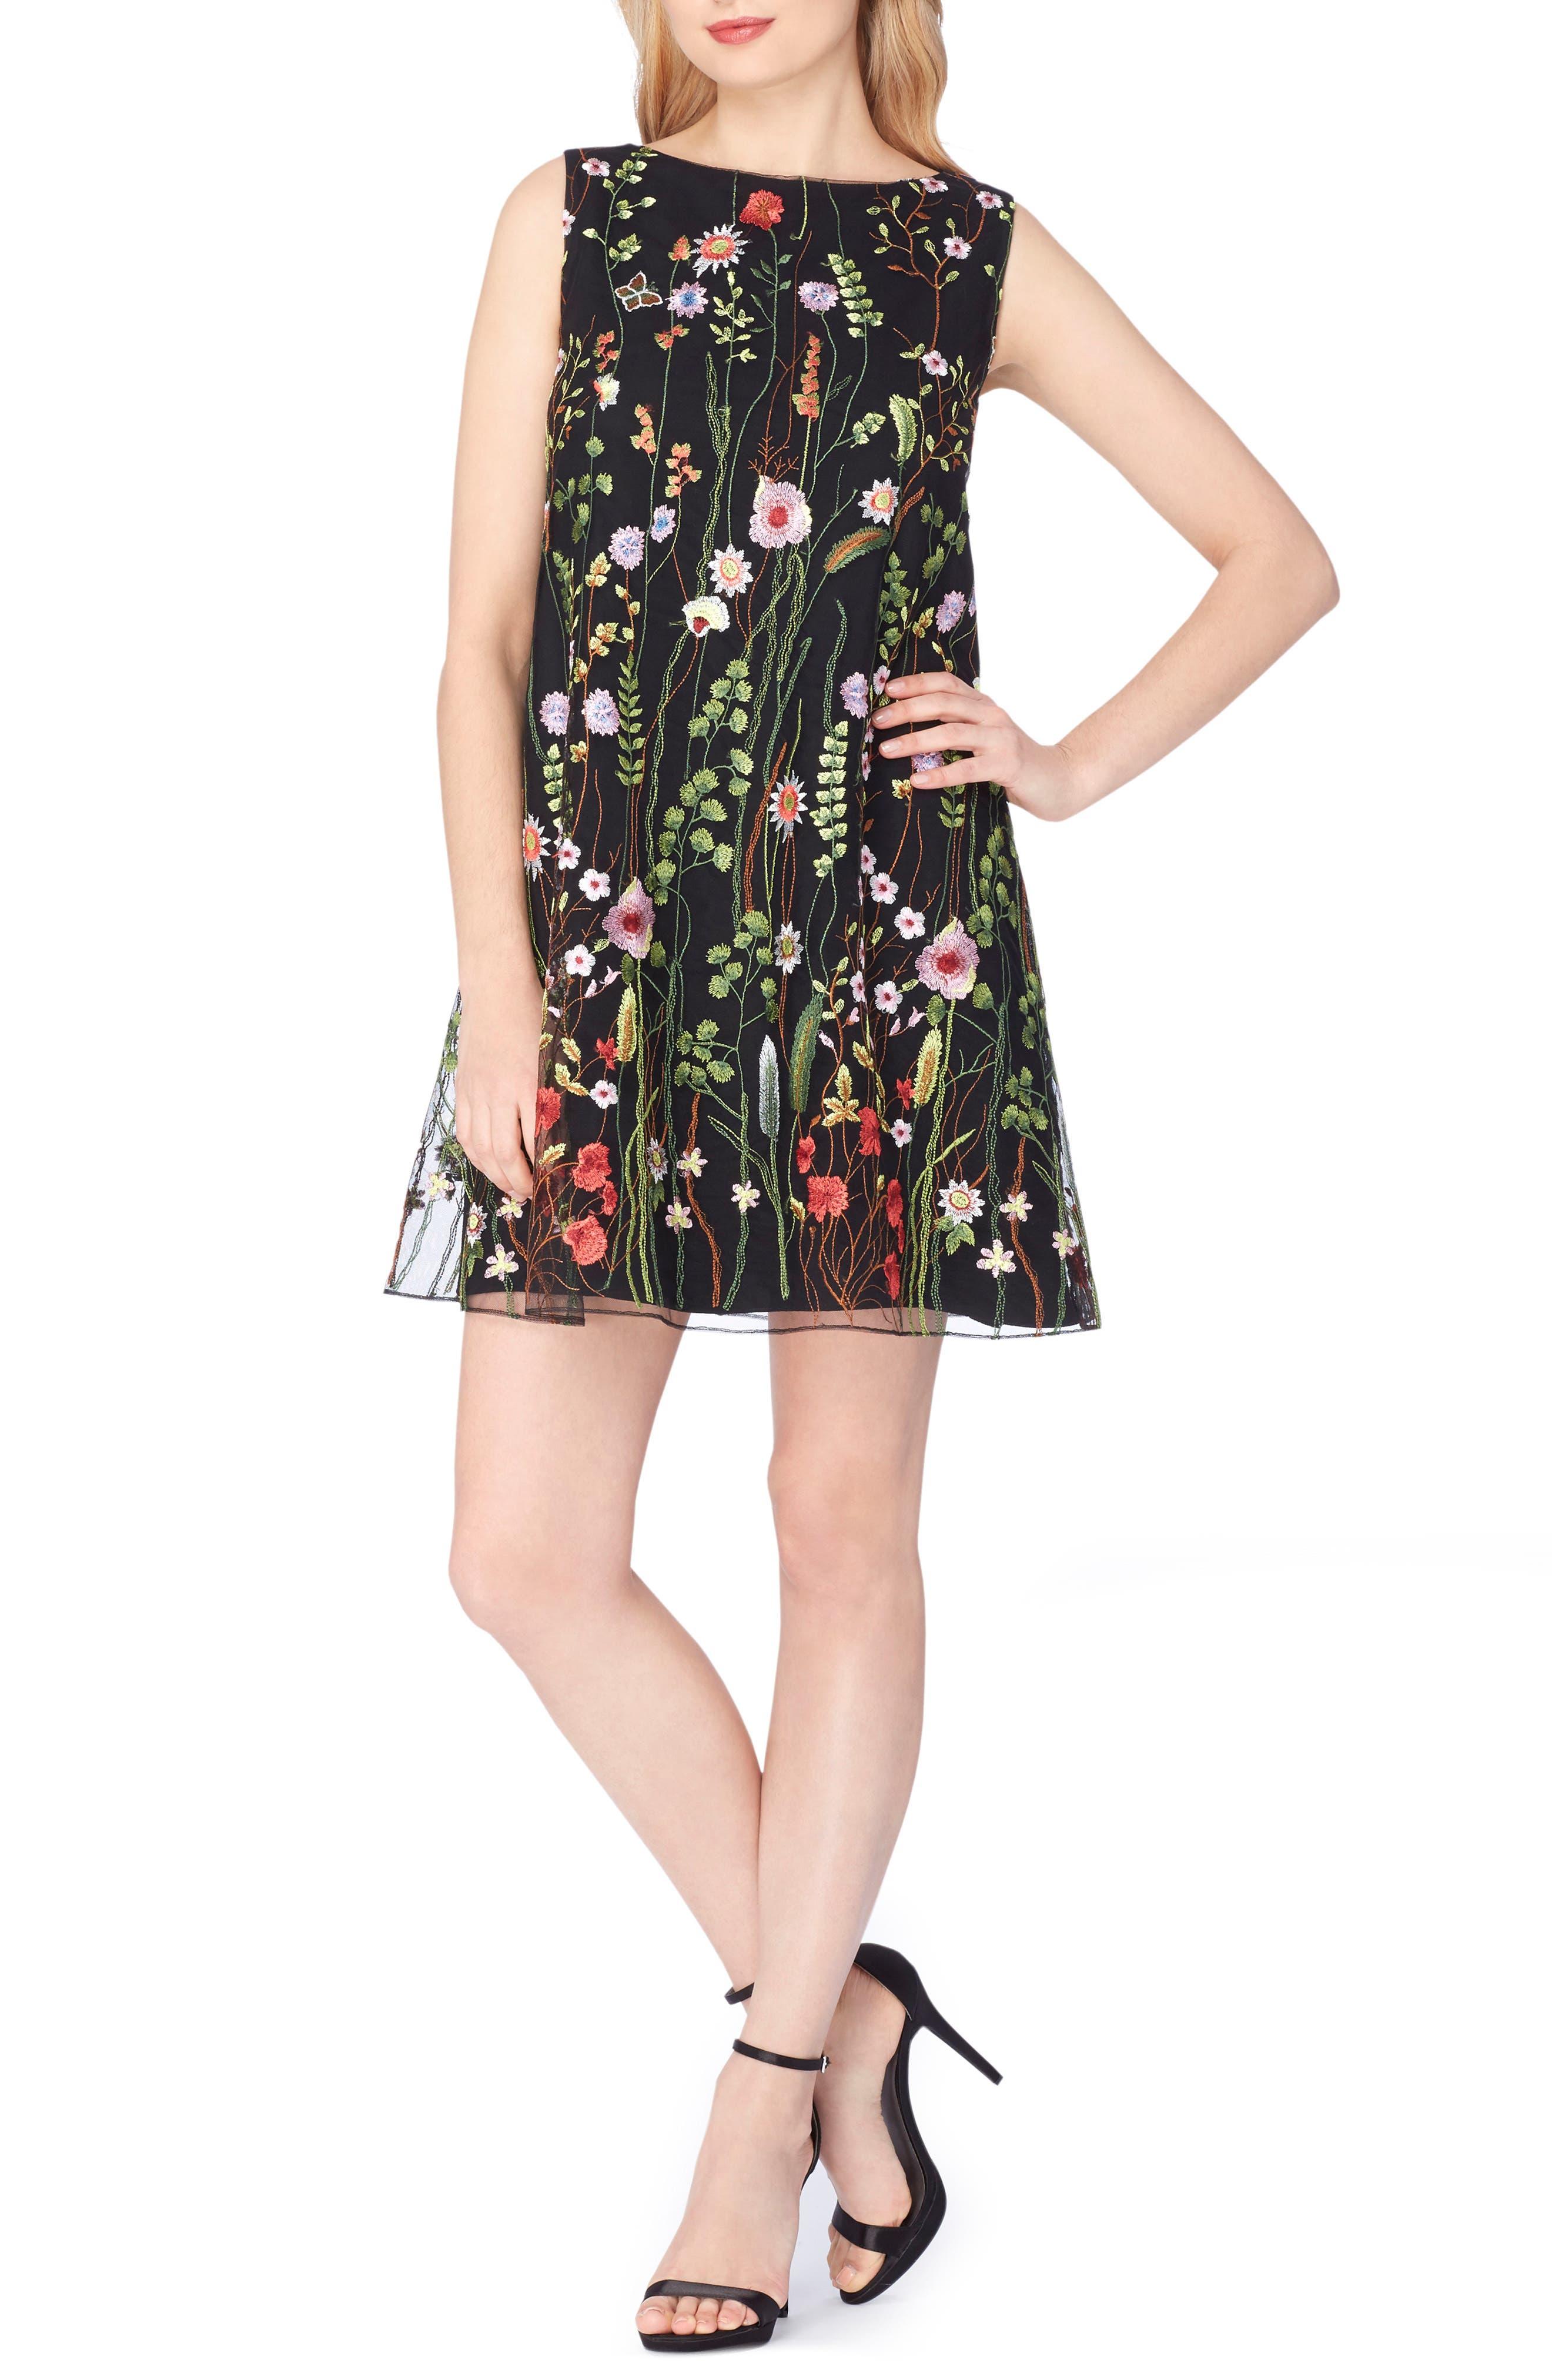 Alternate Image 1 Selected - Tahari Embroidered Shift Dress (Regular & Petite)